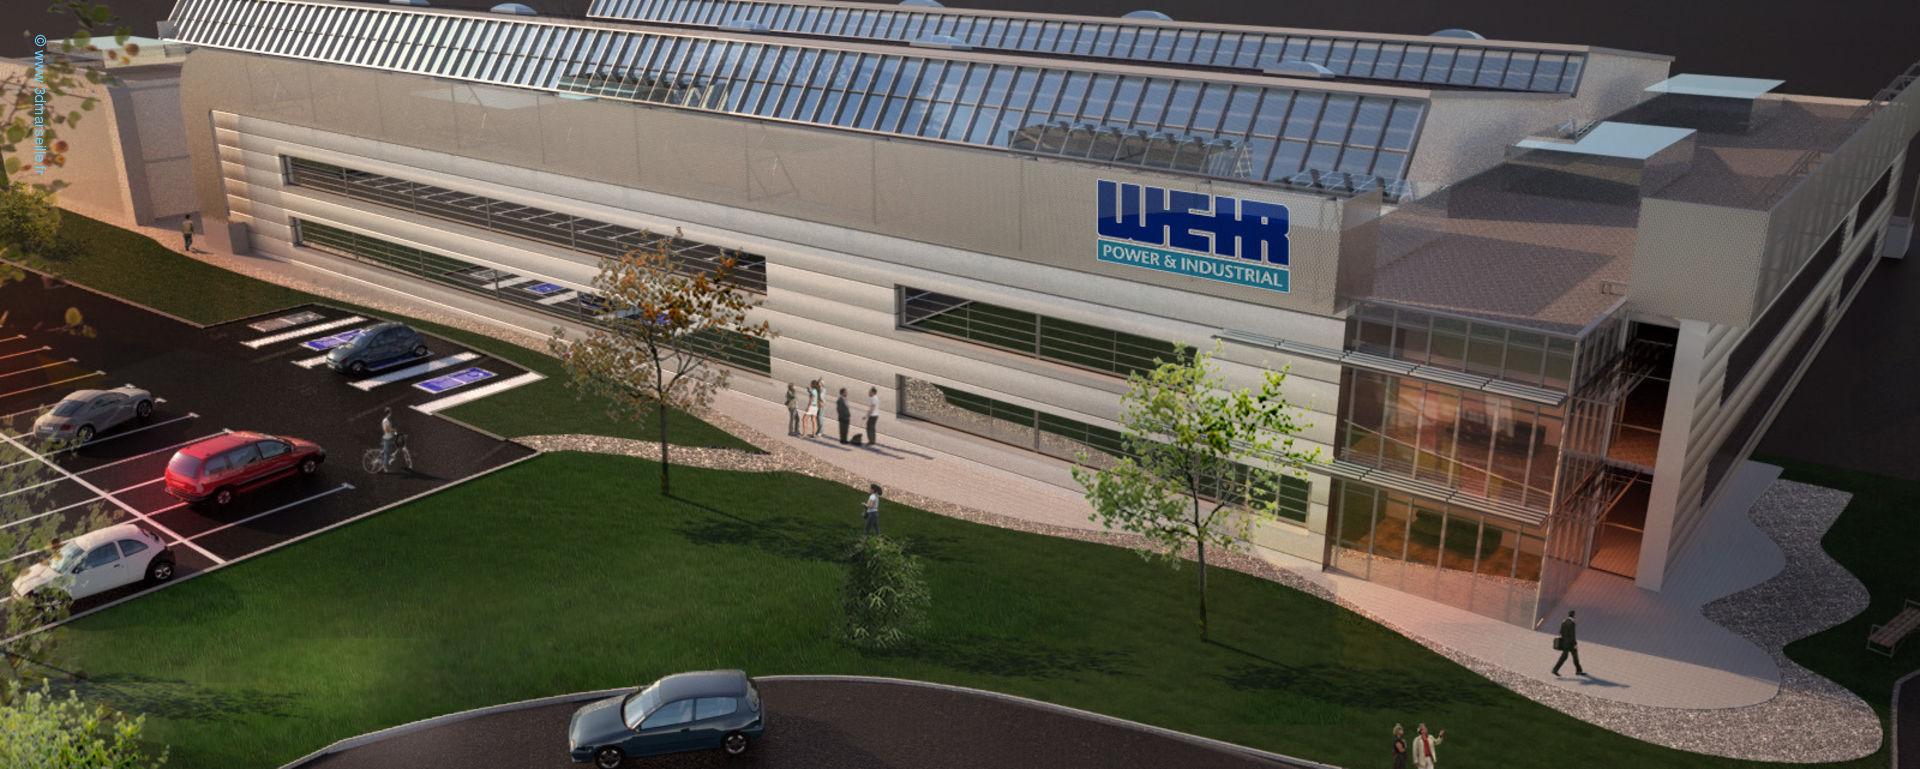 Site industriel St-Victoret WEIR - En images